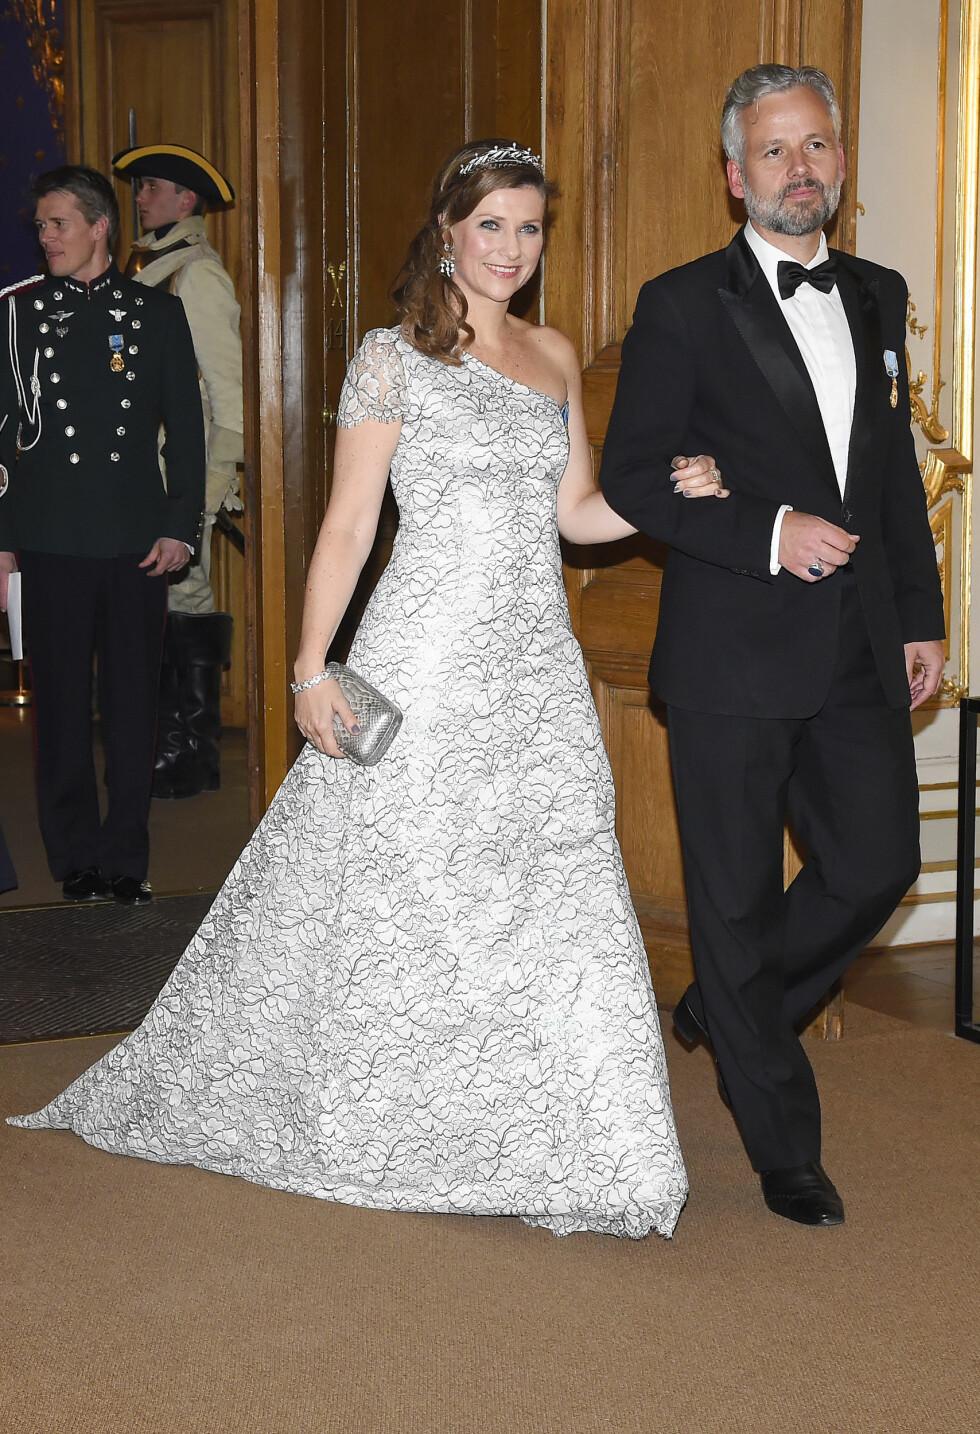 STRÅLTE: I kong Carl Gustafs 70-årsdag 30. april kom Märtha Louise og Ari Behn arm i arm til festen.  Foto: Aftonbladet